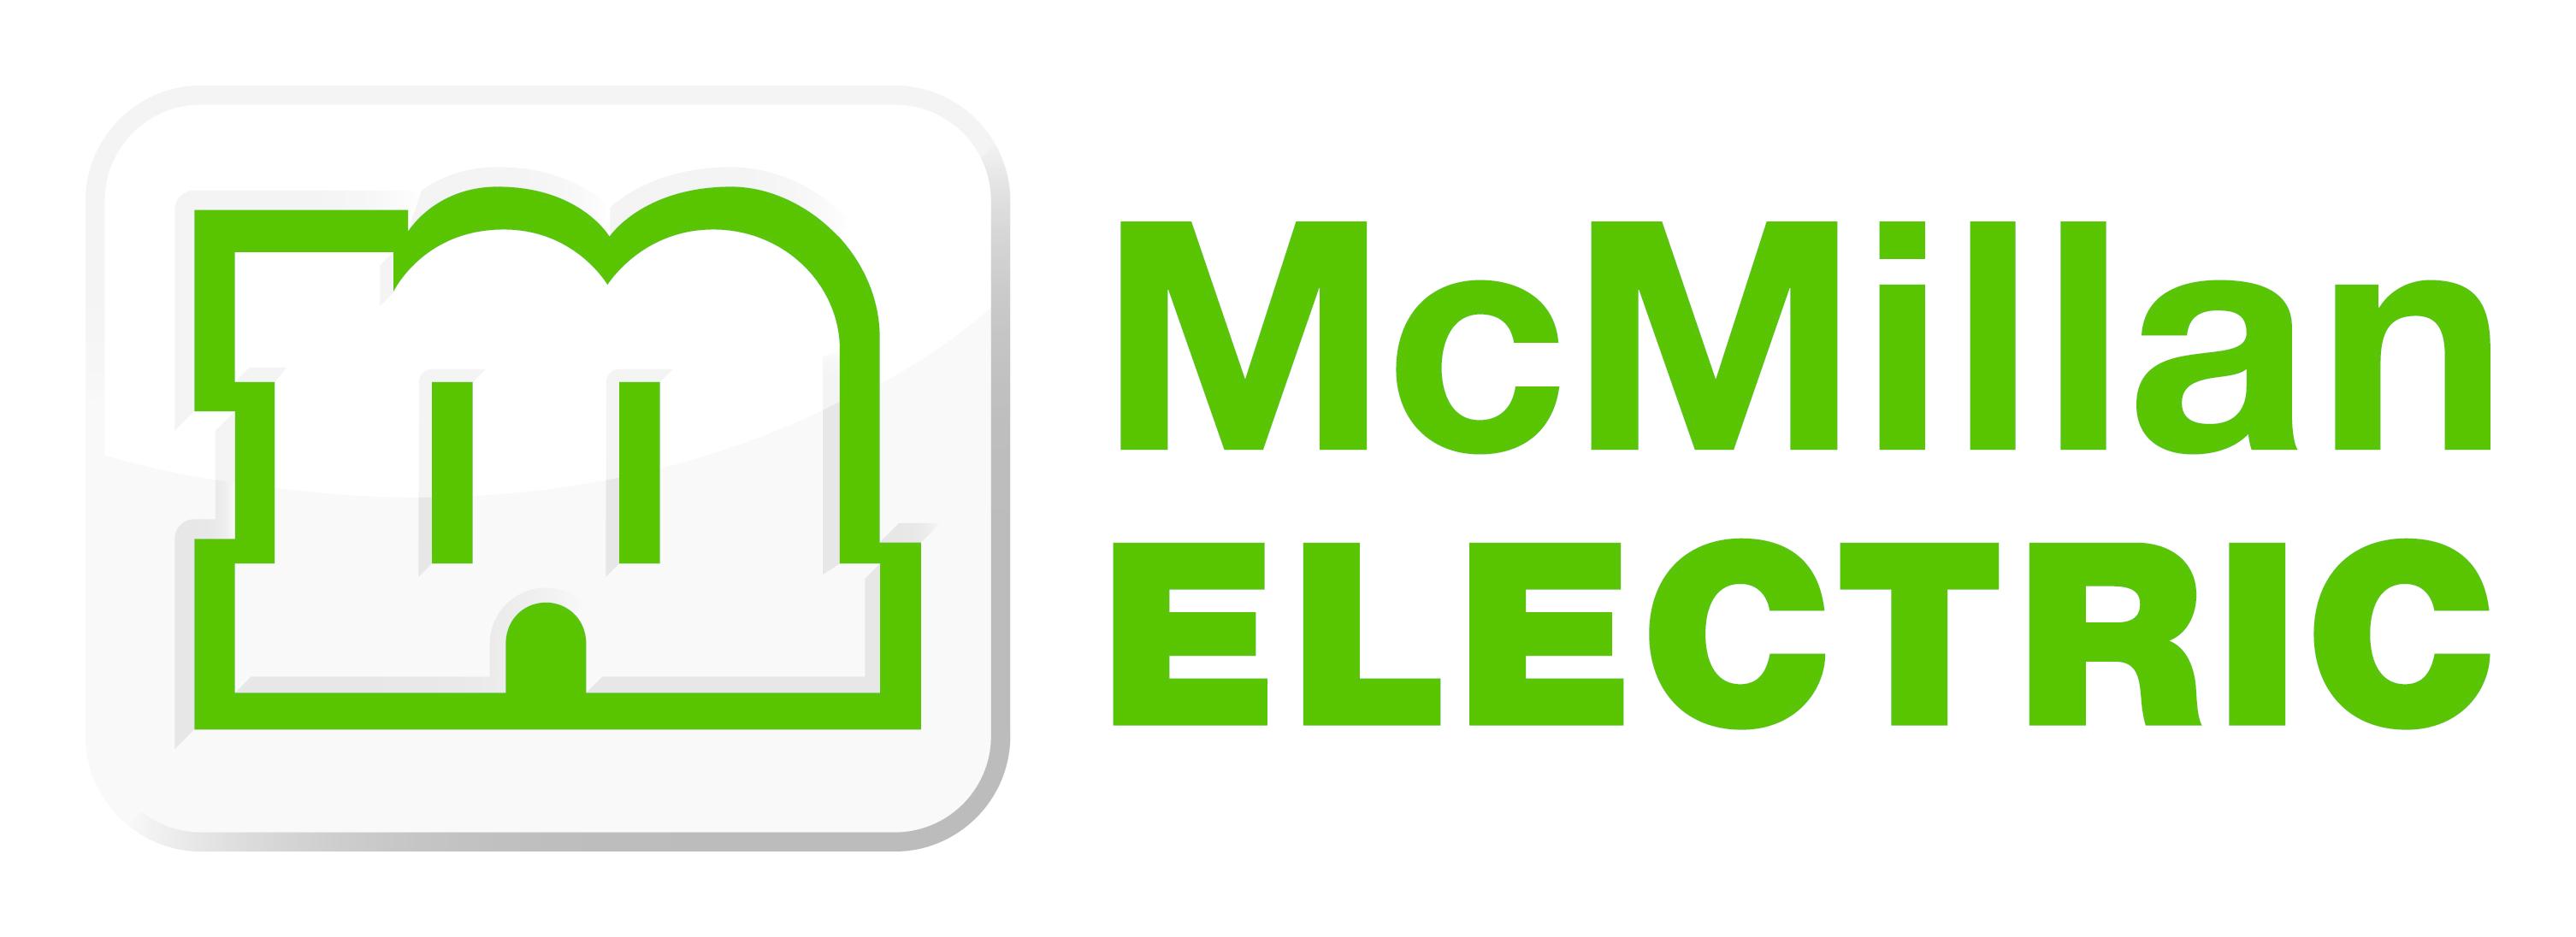 Mcmillan_electric_-_logo_and_name